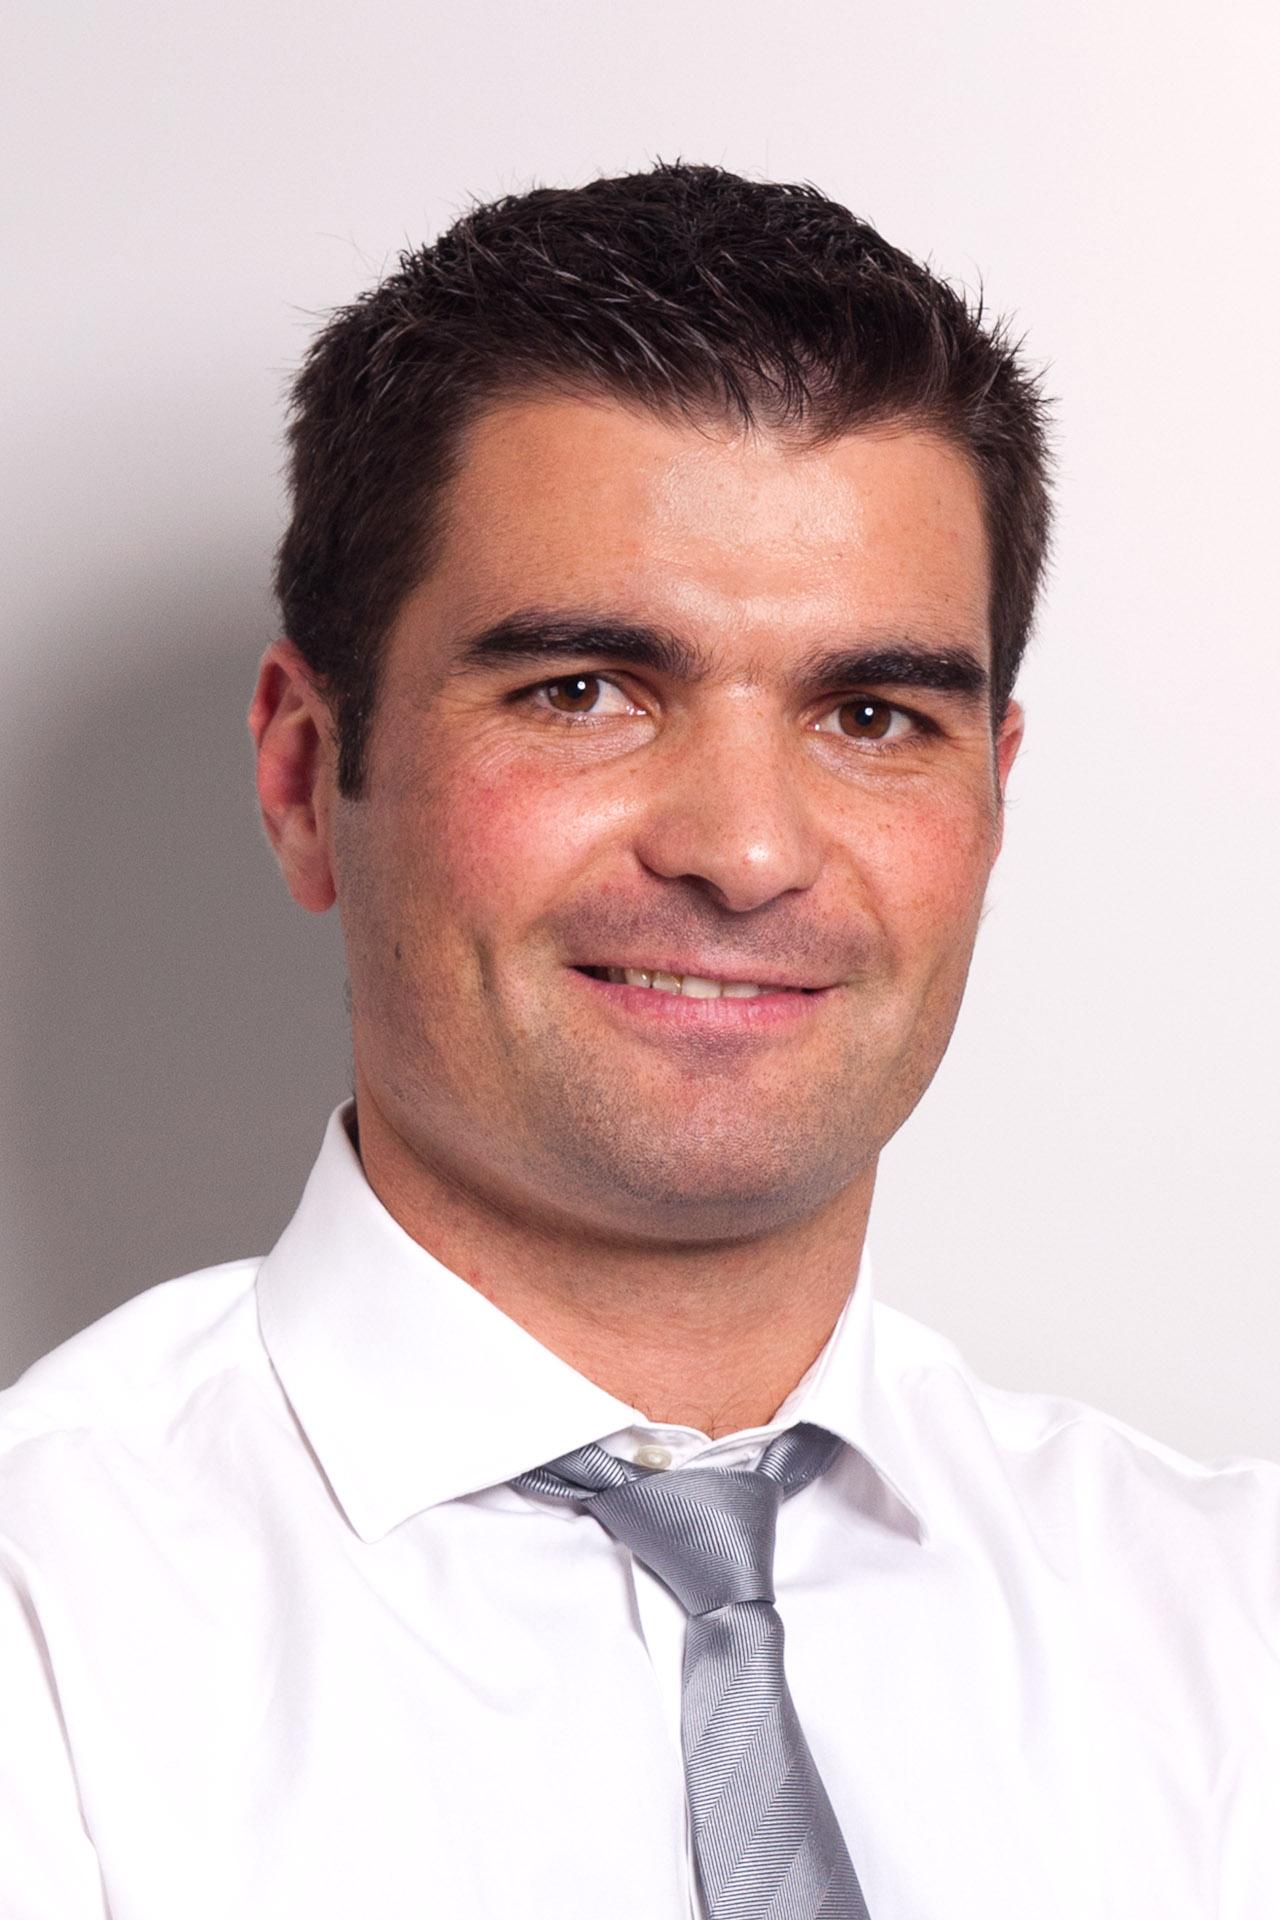 Julien Depollier